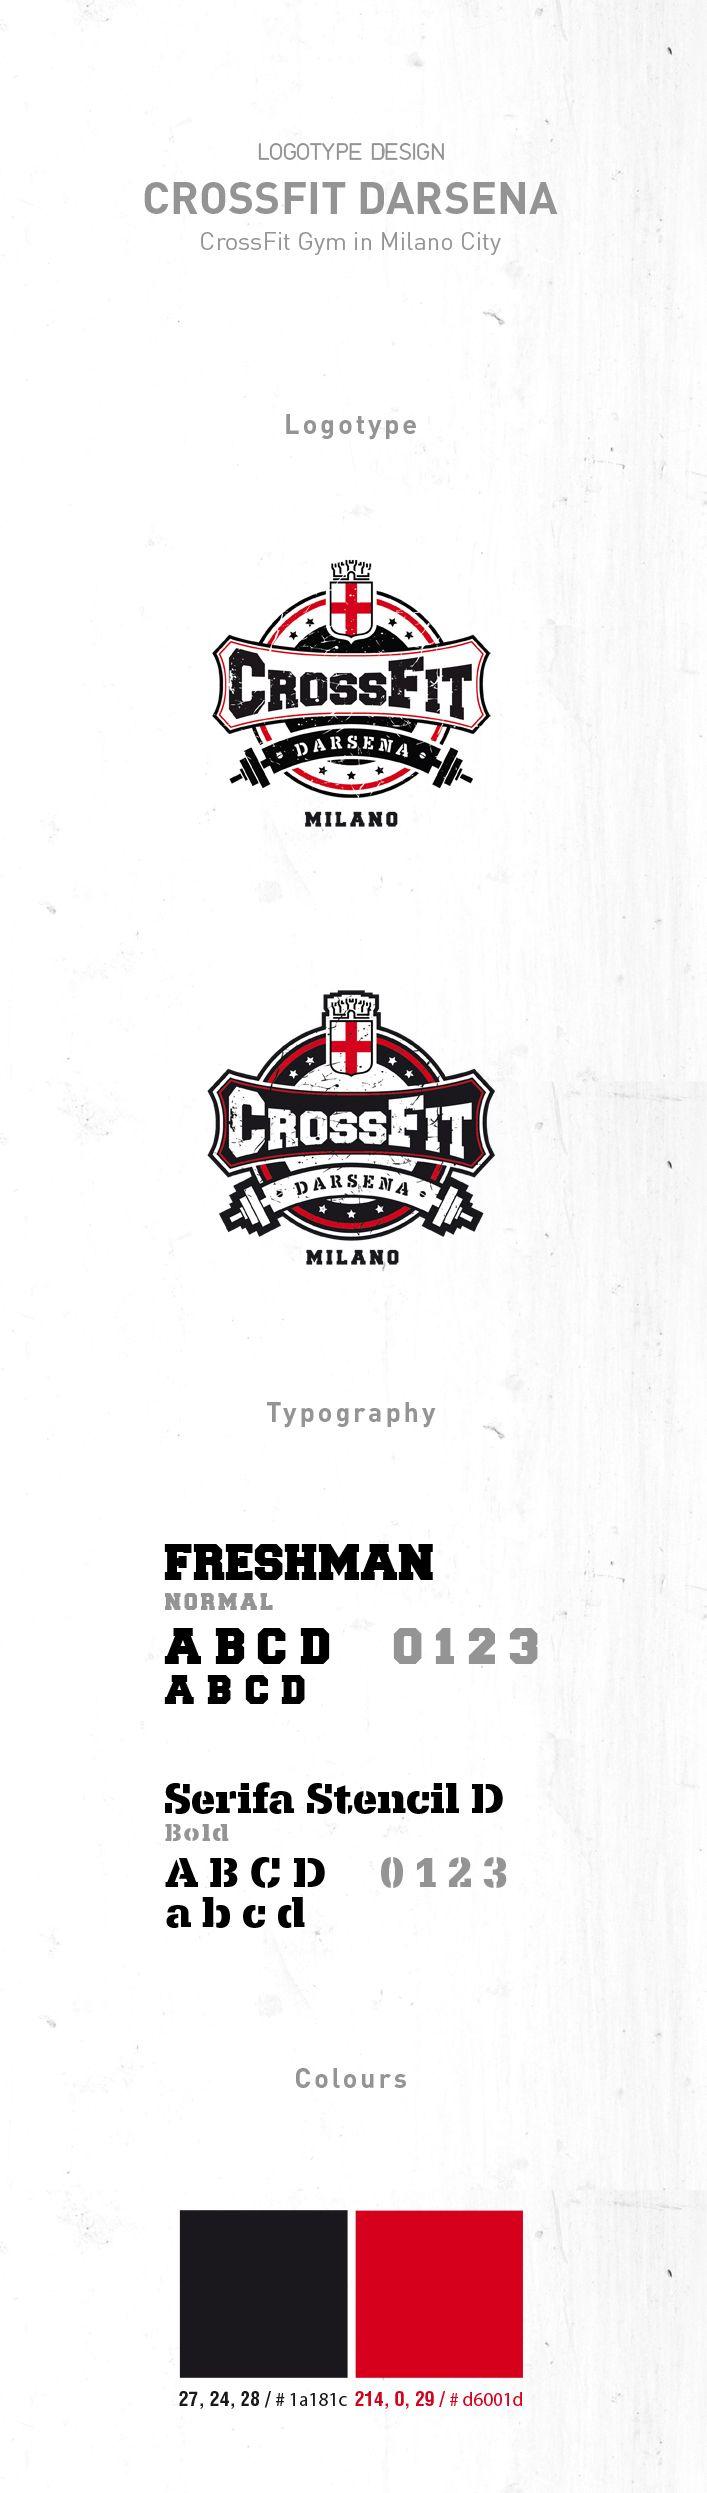 Crossfit Darsena Milano / Crossfit Gym on Behance